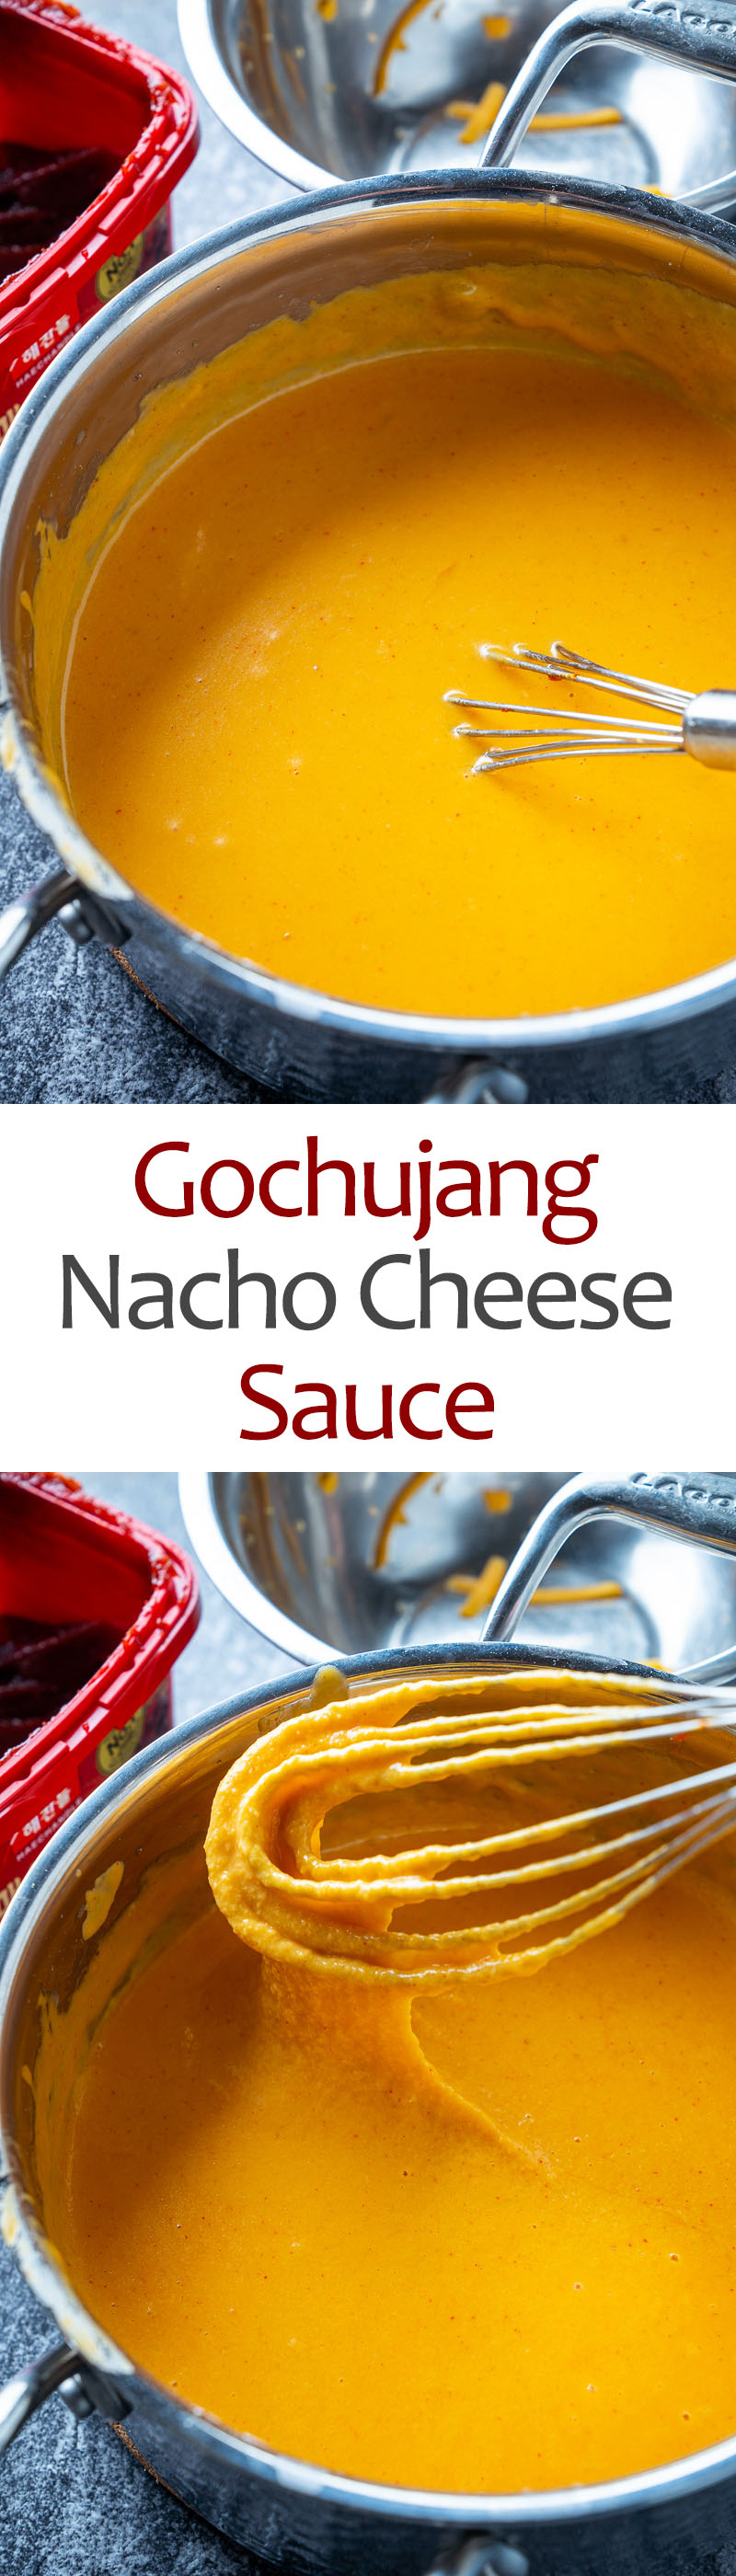 Gochujang Nacho Cheese Sauce